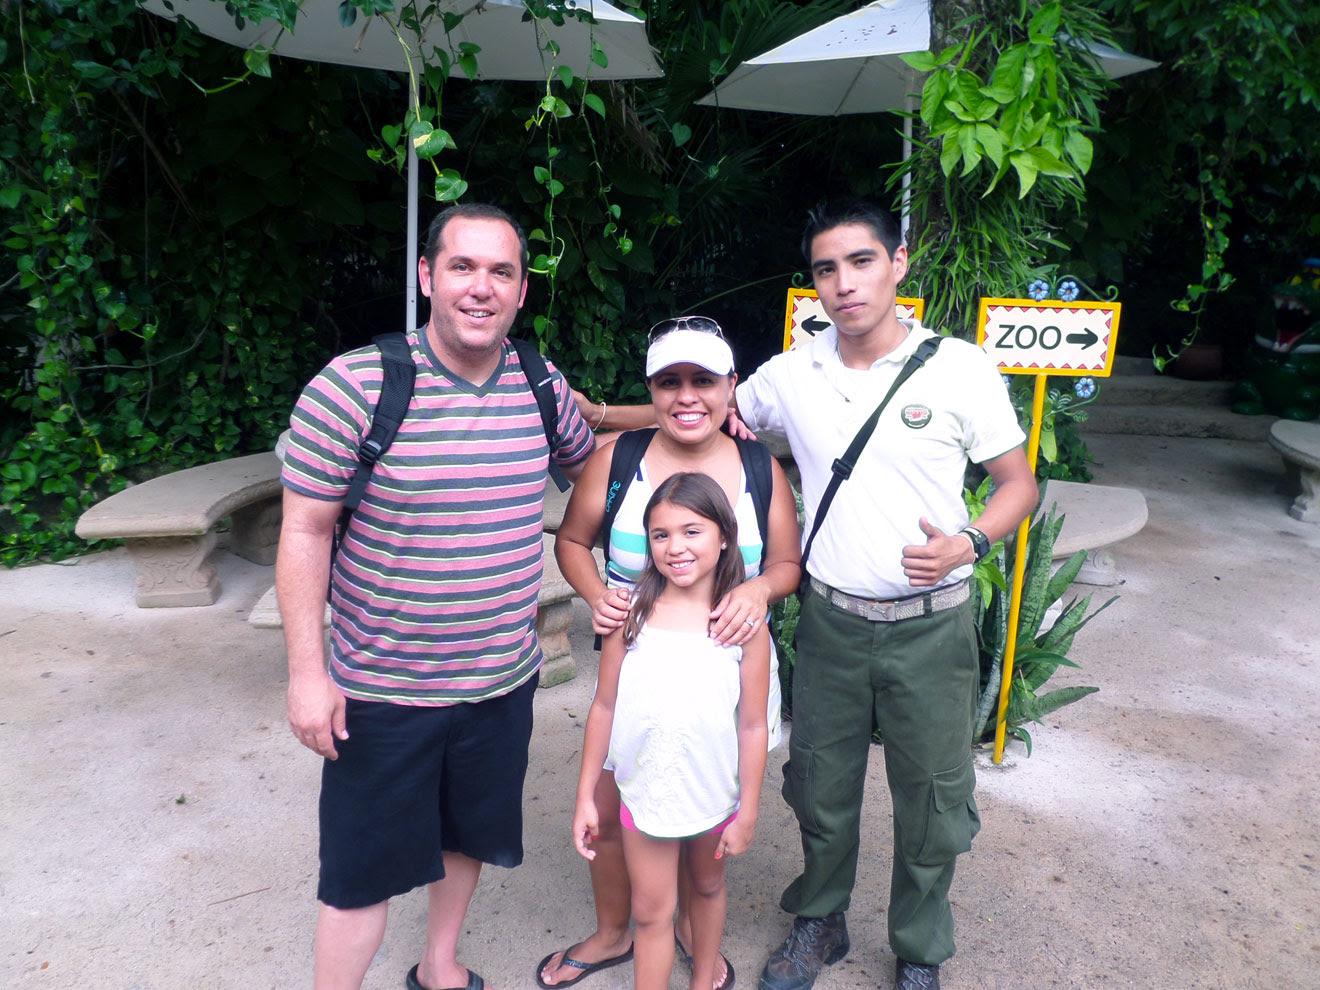 Cancun's CrocoCun Zoo Photo Gallery | FamilyVacationHub.com